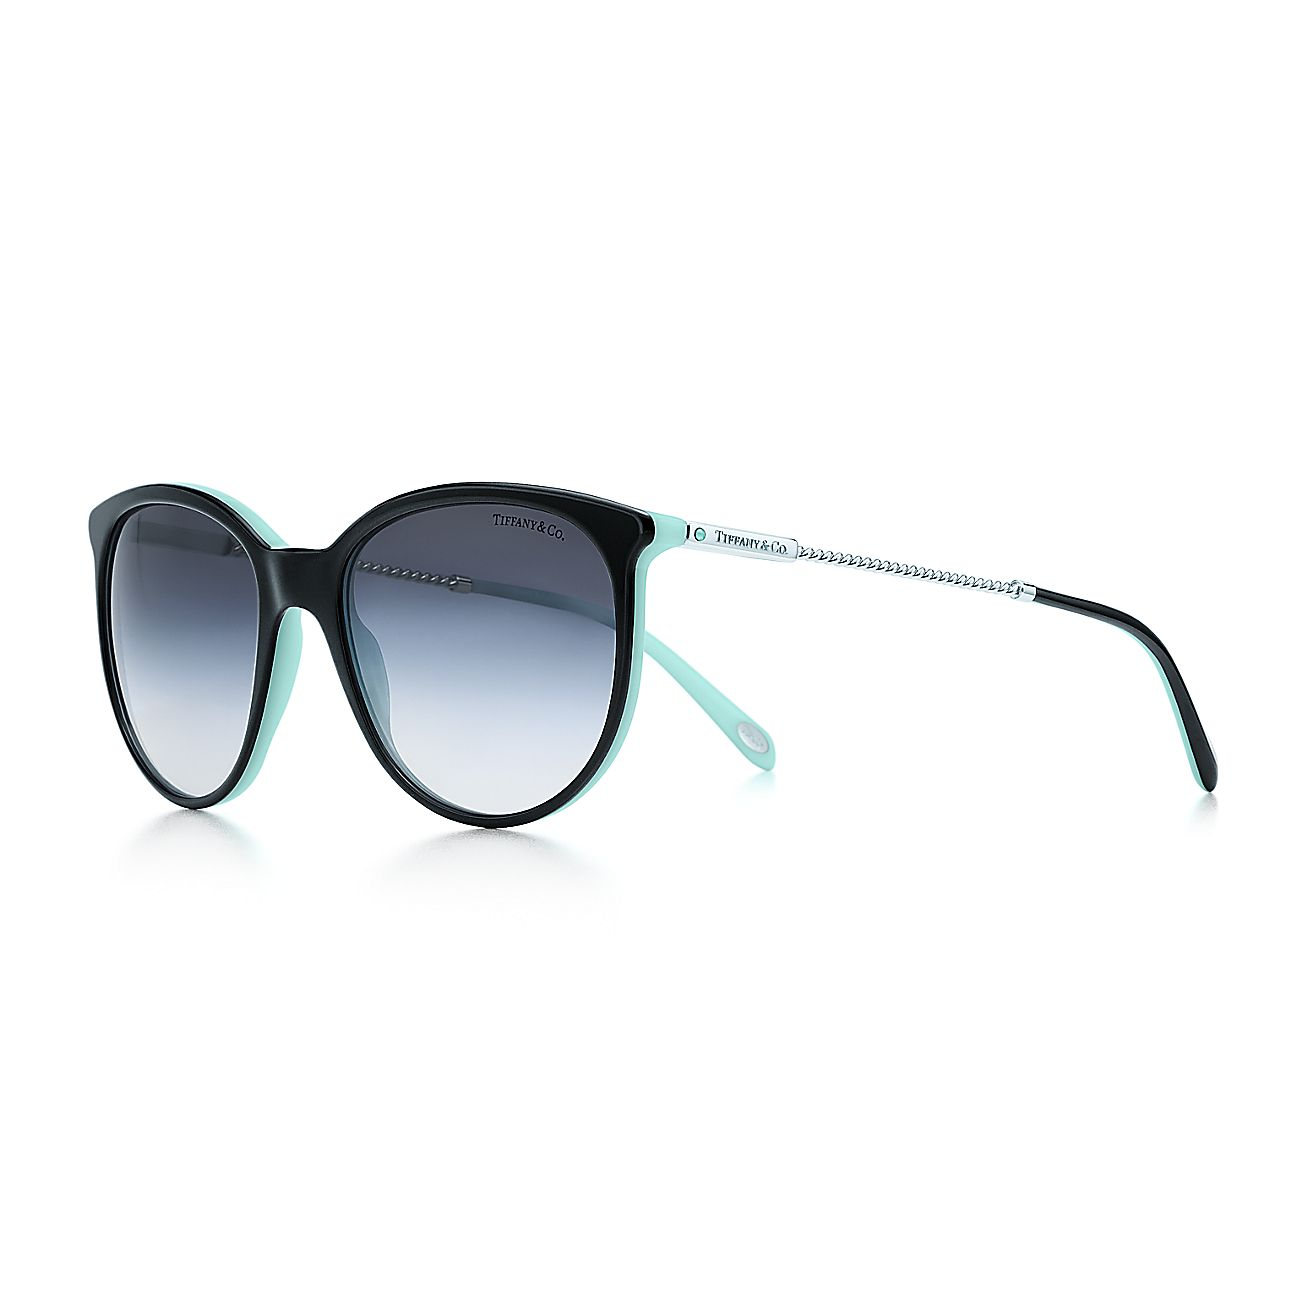 Tiffany Twist:Round Sunglasses